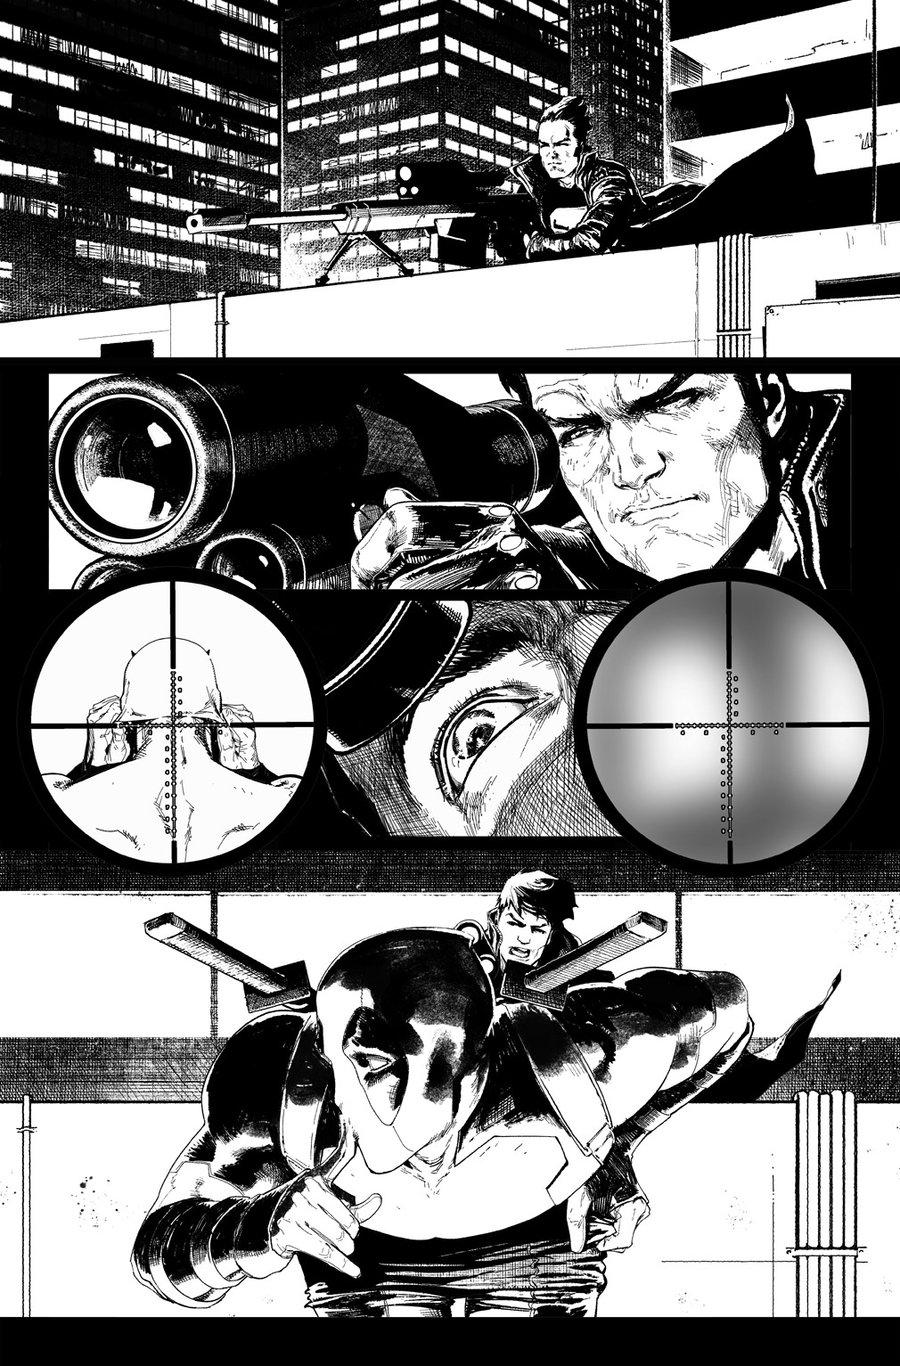 Image of DEFENDERS #7 p.21 ARTIST'S PROOF